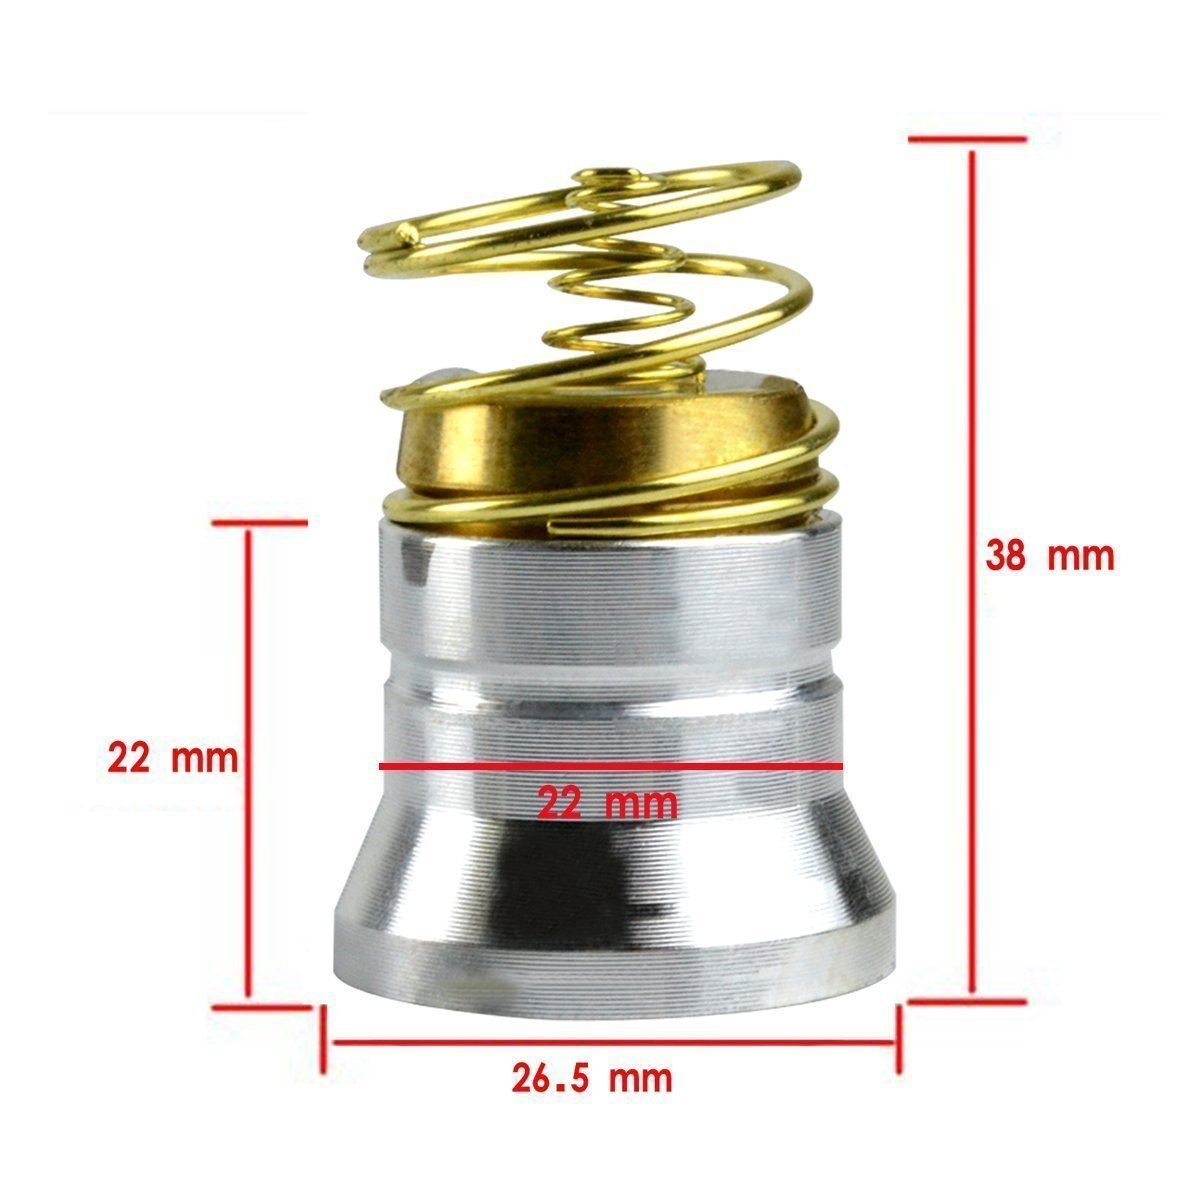 Amazon.com: BESTSUN 395nm Ultraviolet UV LED Black Light Flashlight Bulb 1 Mode Drop-in P60 Design Module Torch Repair Parts Replacement Bulb for Surefire ...